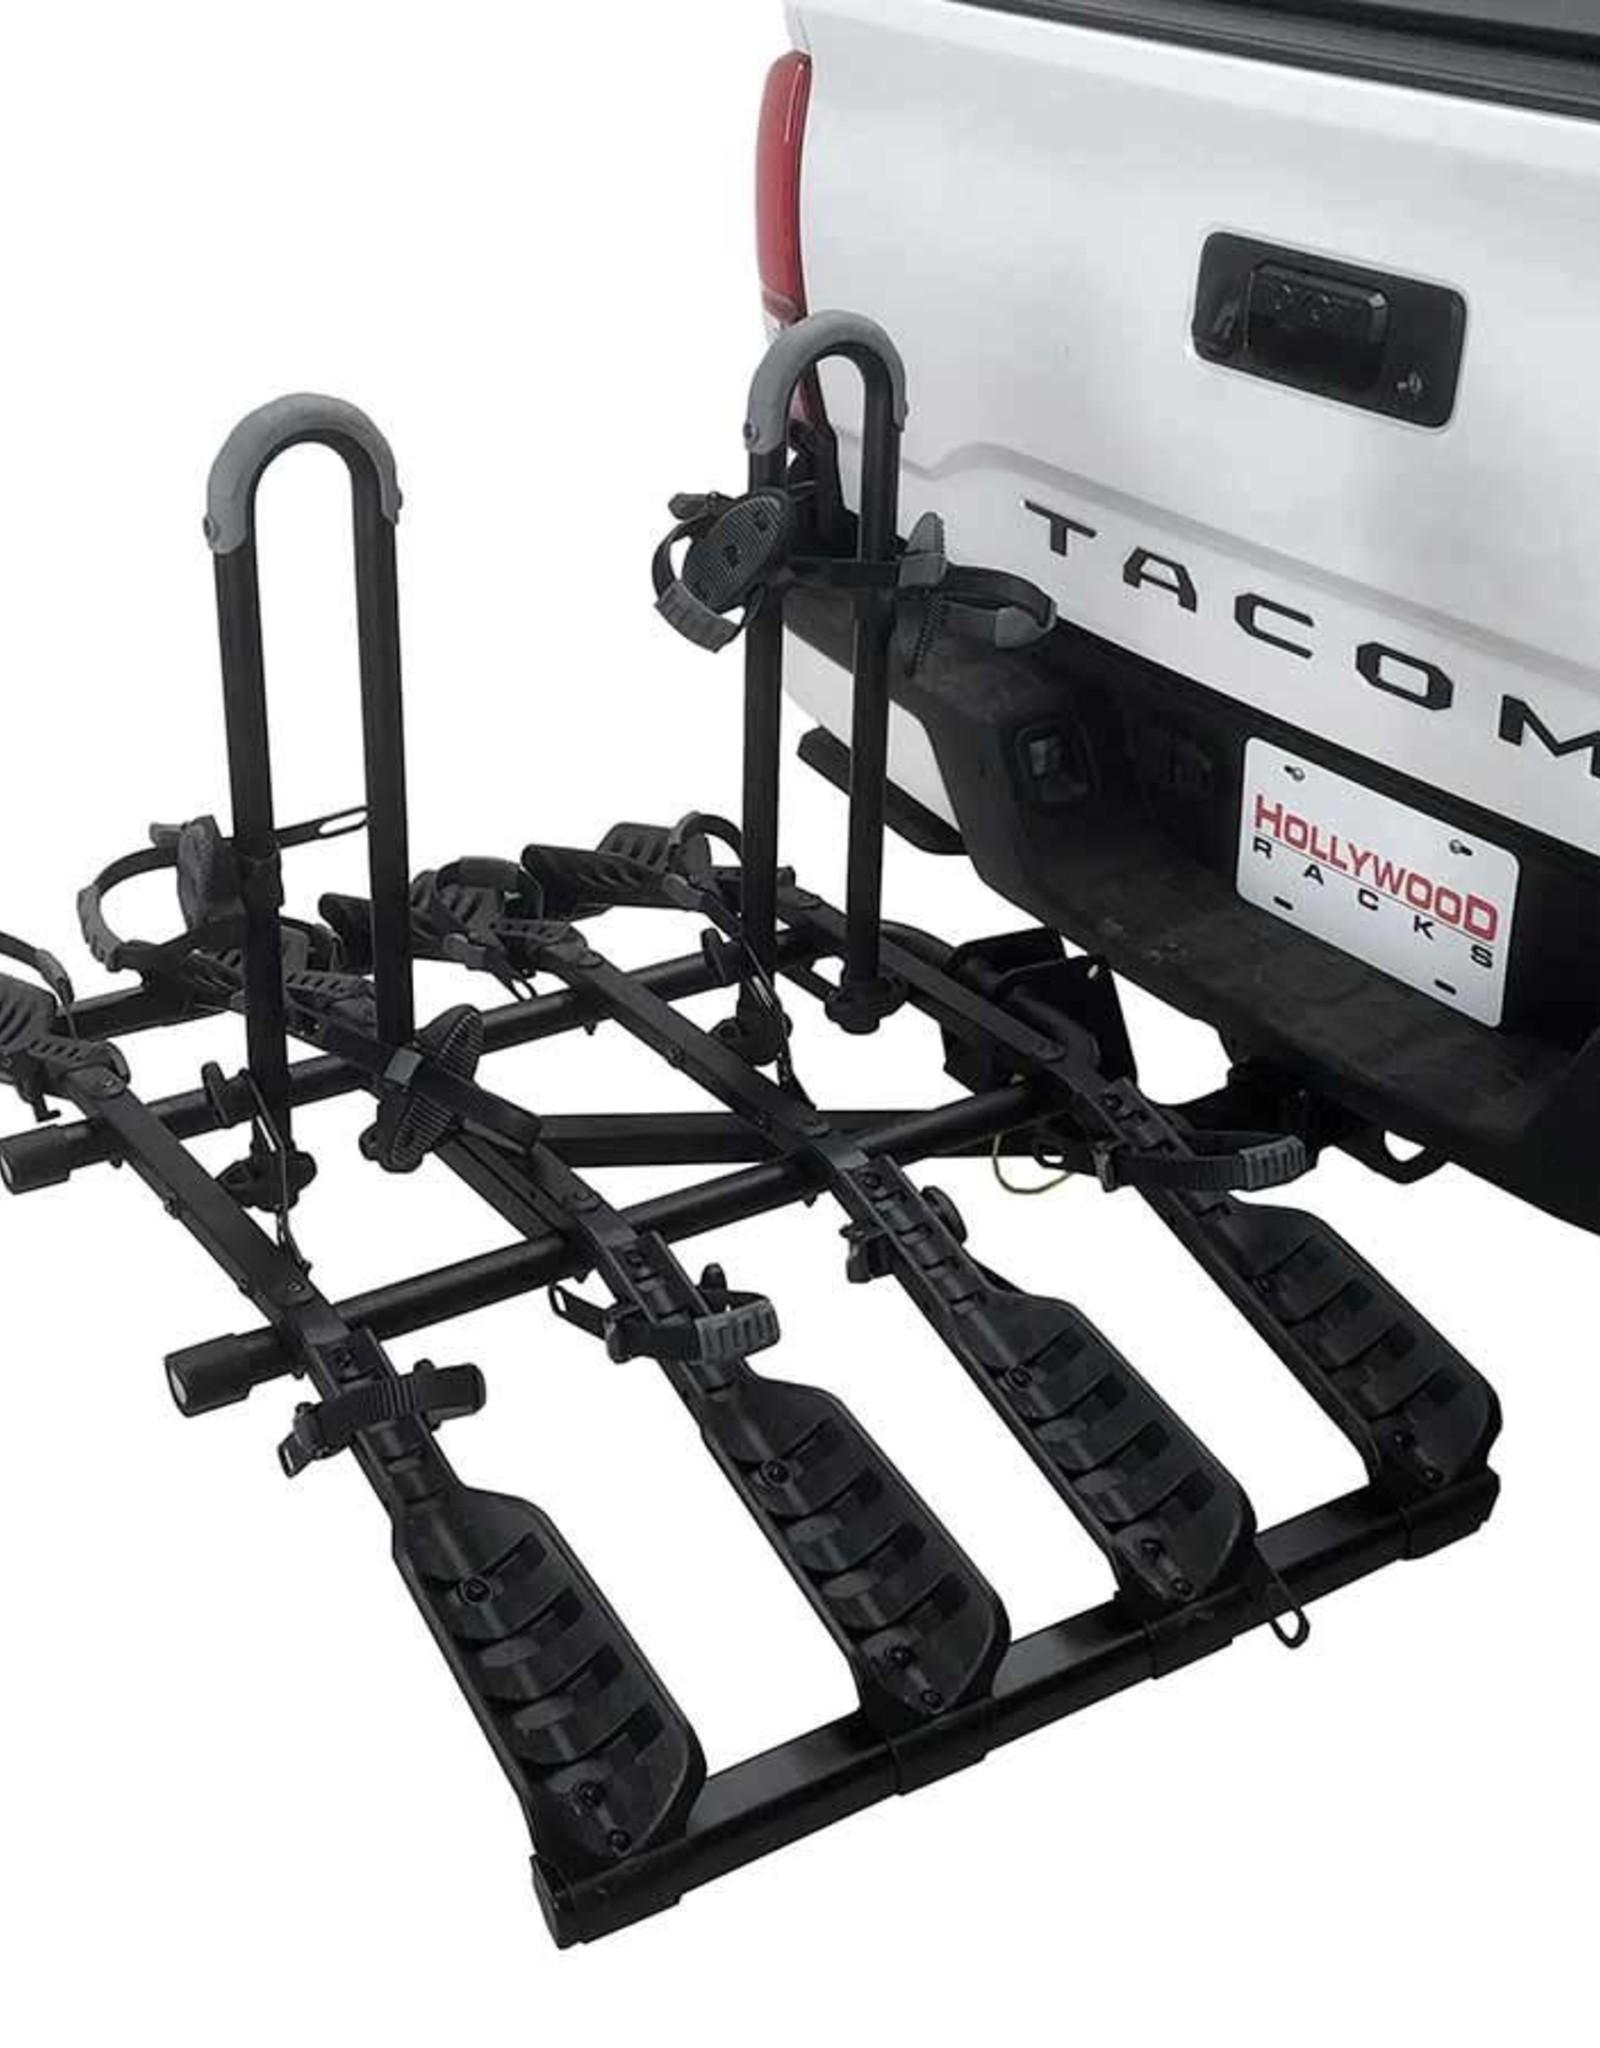 hollywood racks destination hitch mount rack 2 bikes 4